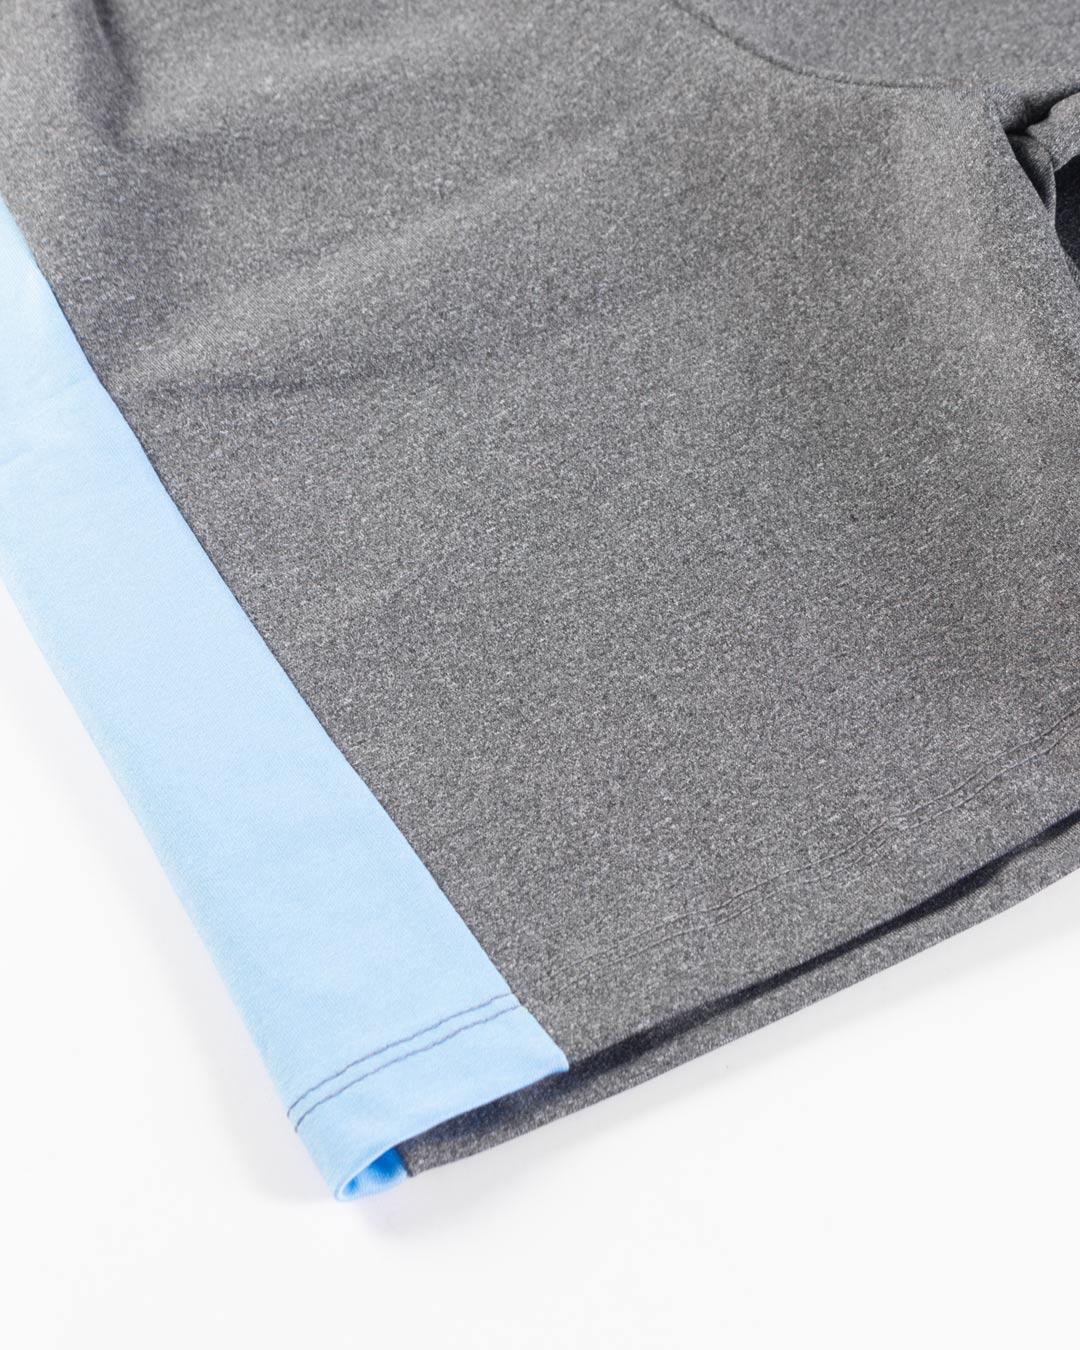 Shorts Fitness Mescla Com Barra Lateral Azul - Movimente-se